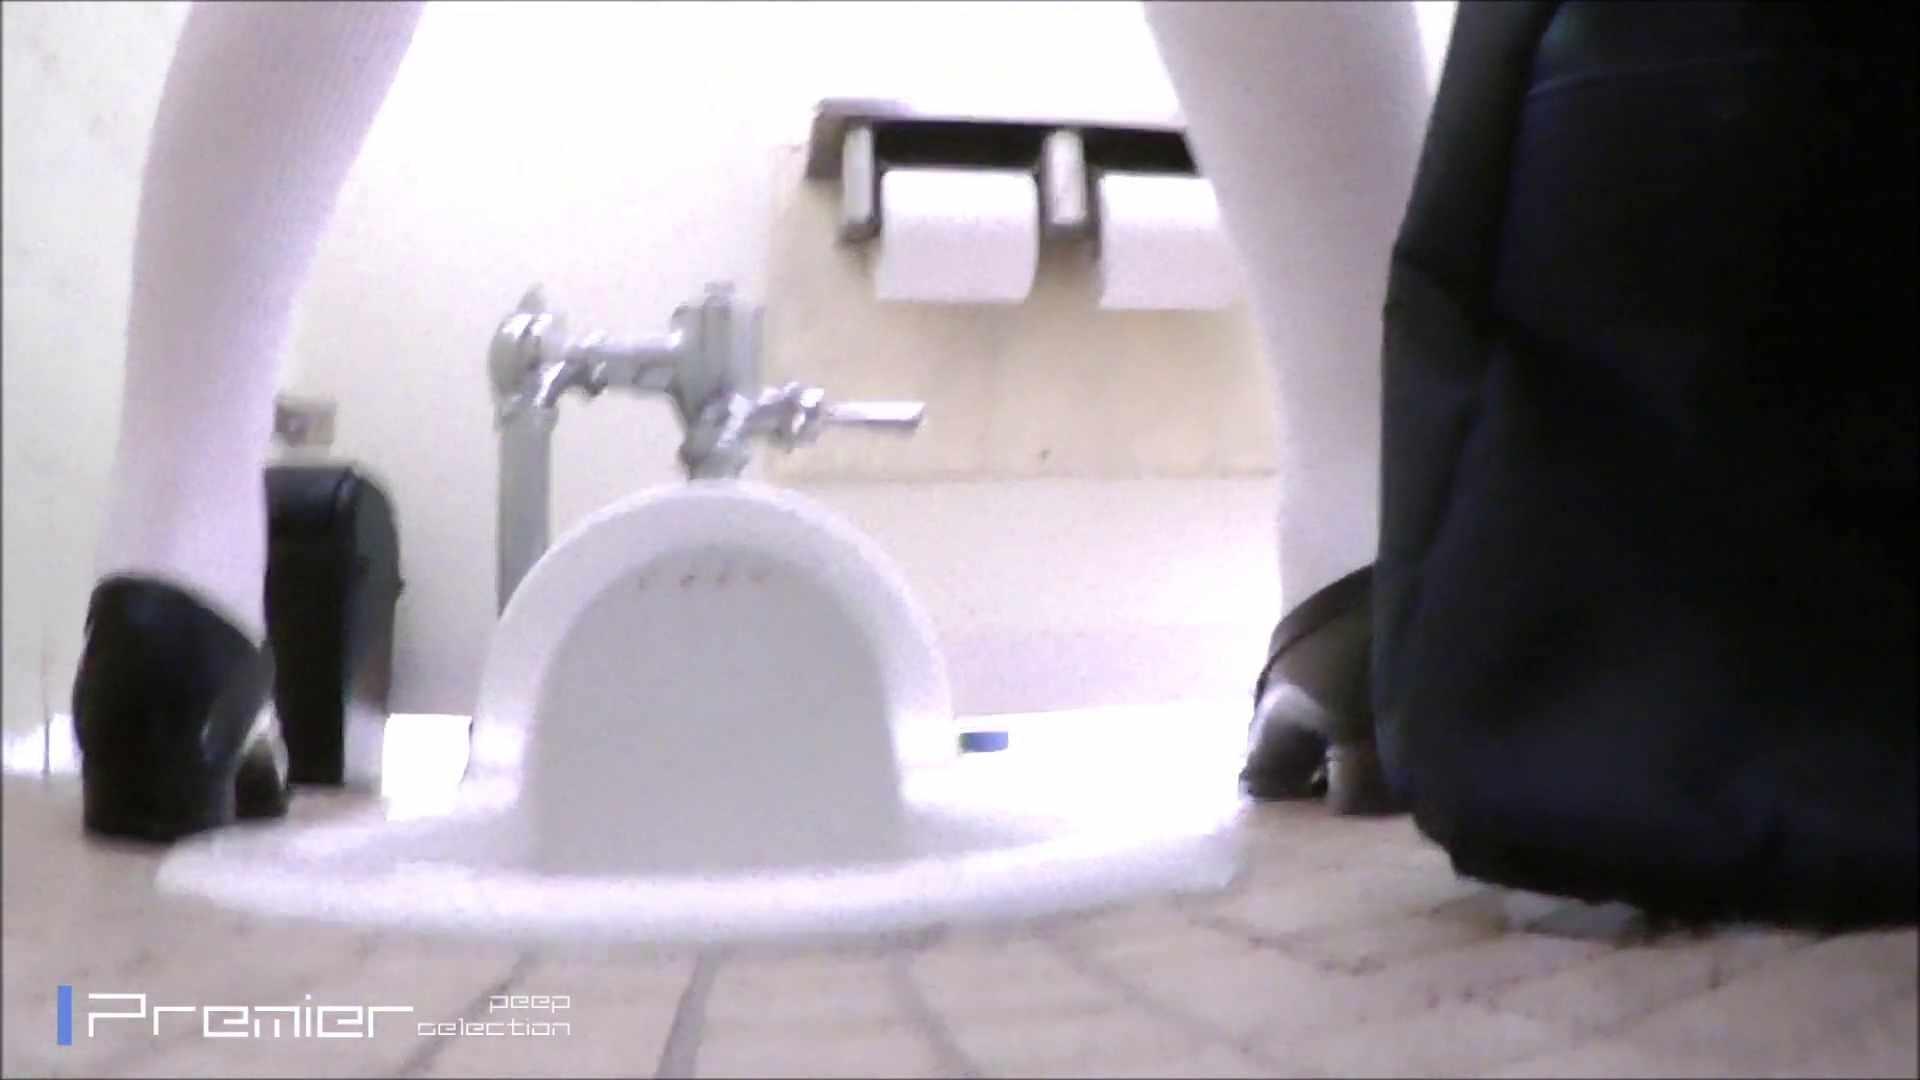 FHD激カワ!激やば! 復讐のトイレ盗撮 Vol.03 名作殿堂  78PIX 11